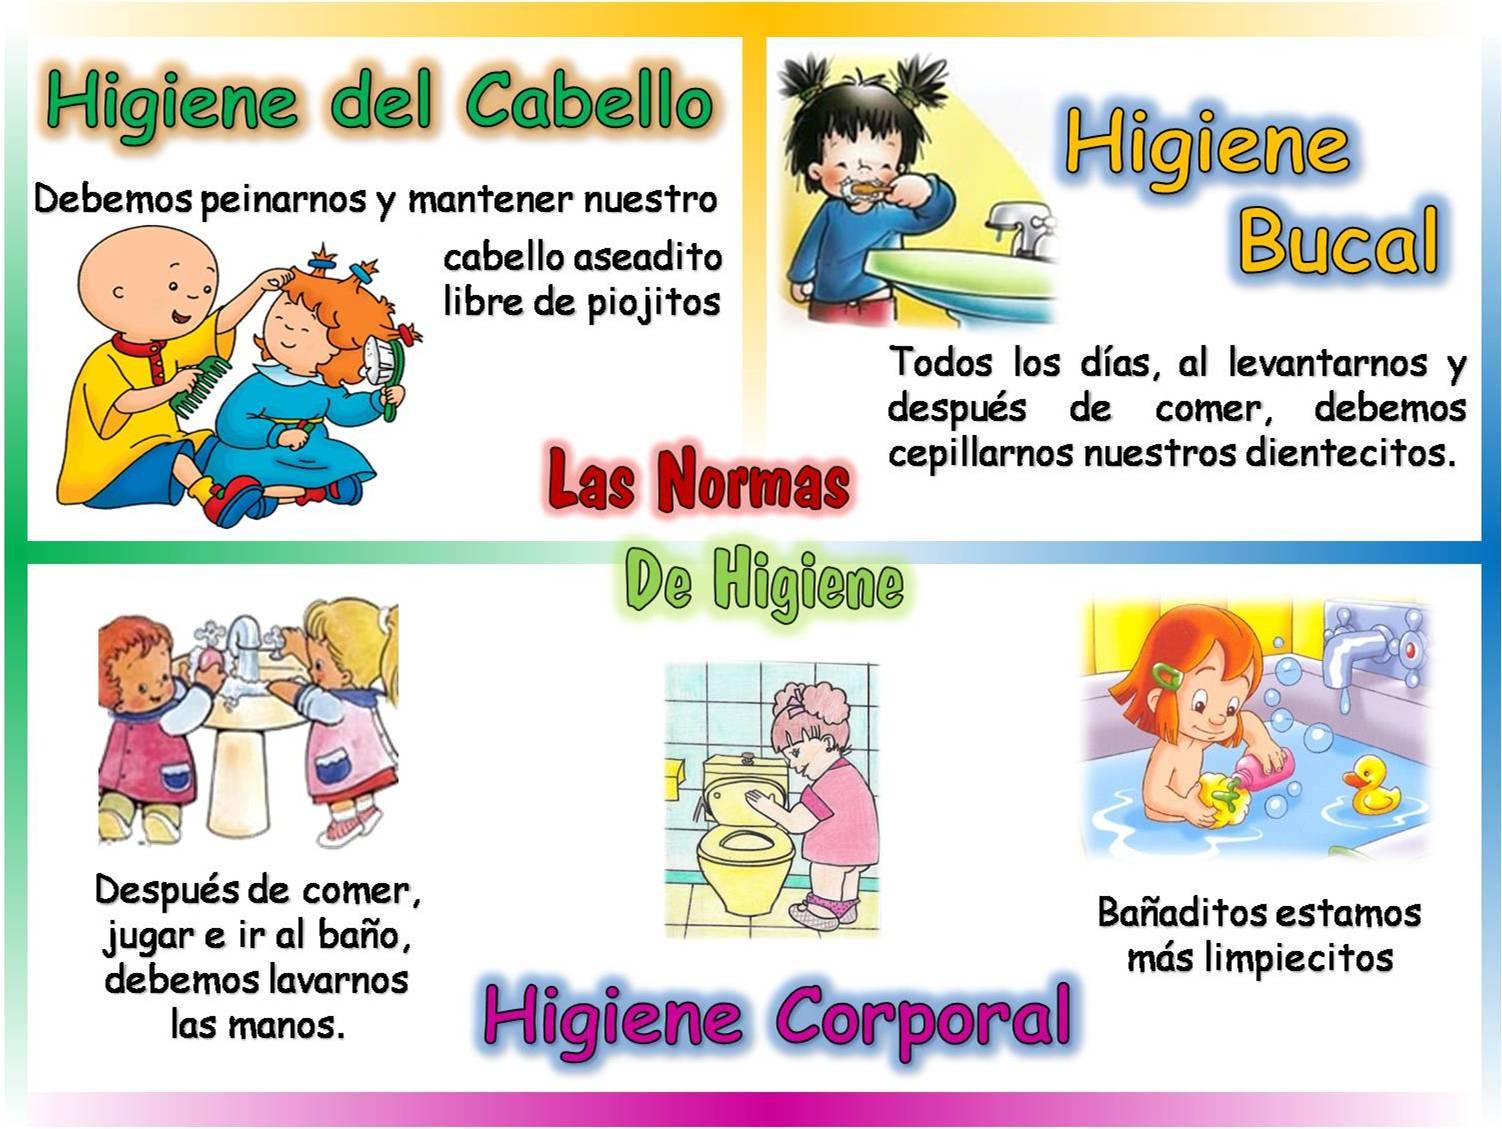 Las normas de higiene la higiene personal for Normas de higiene personal en la cocina